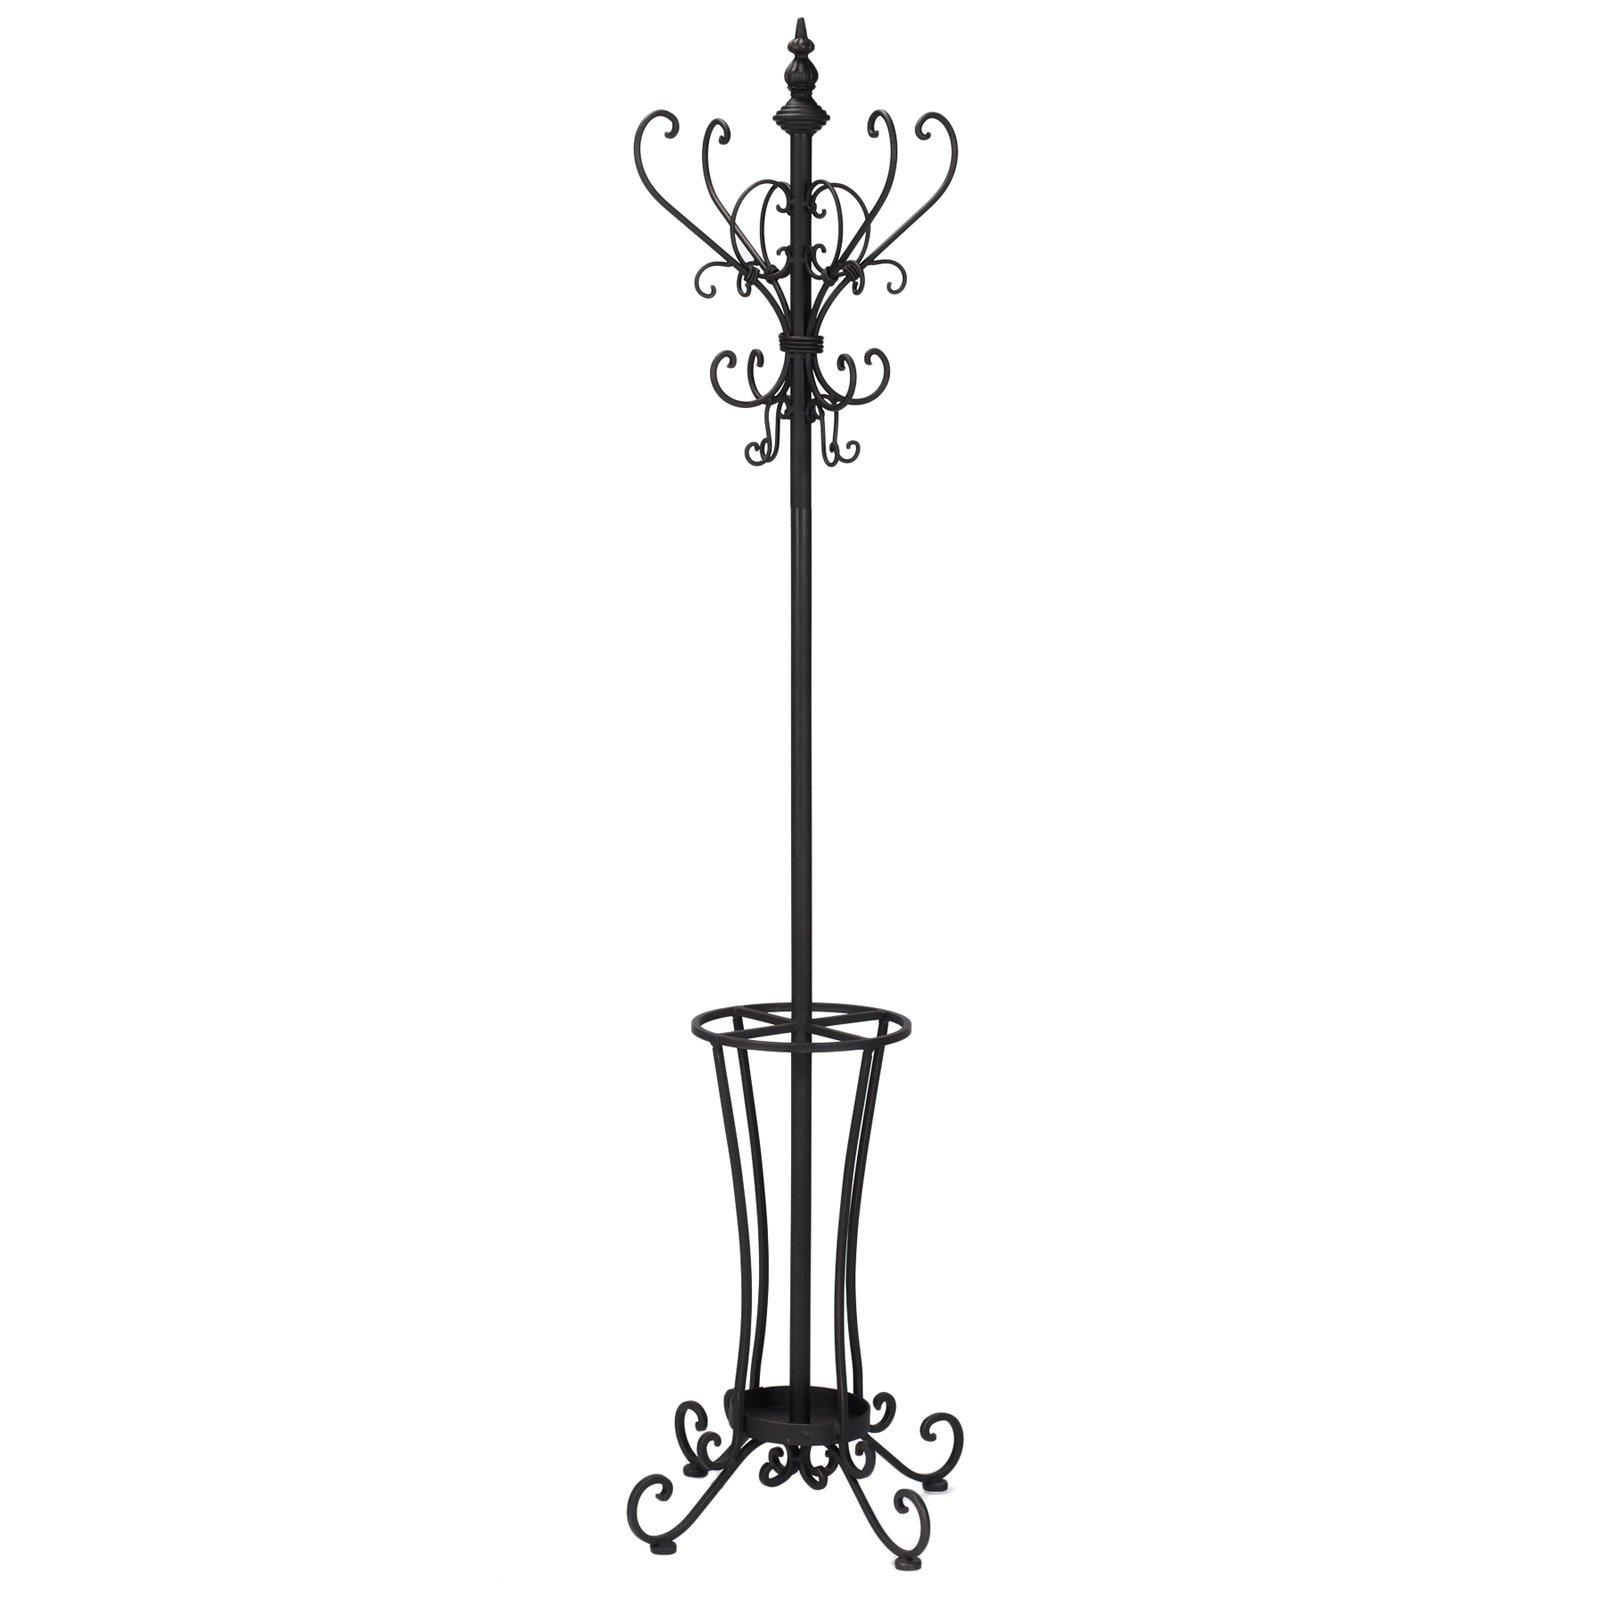 Rustic Metal Scroll Hall Tree - Decorative Hooks & Umbrella Rack - Wrought Iron Frame